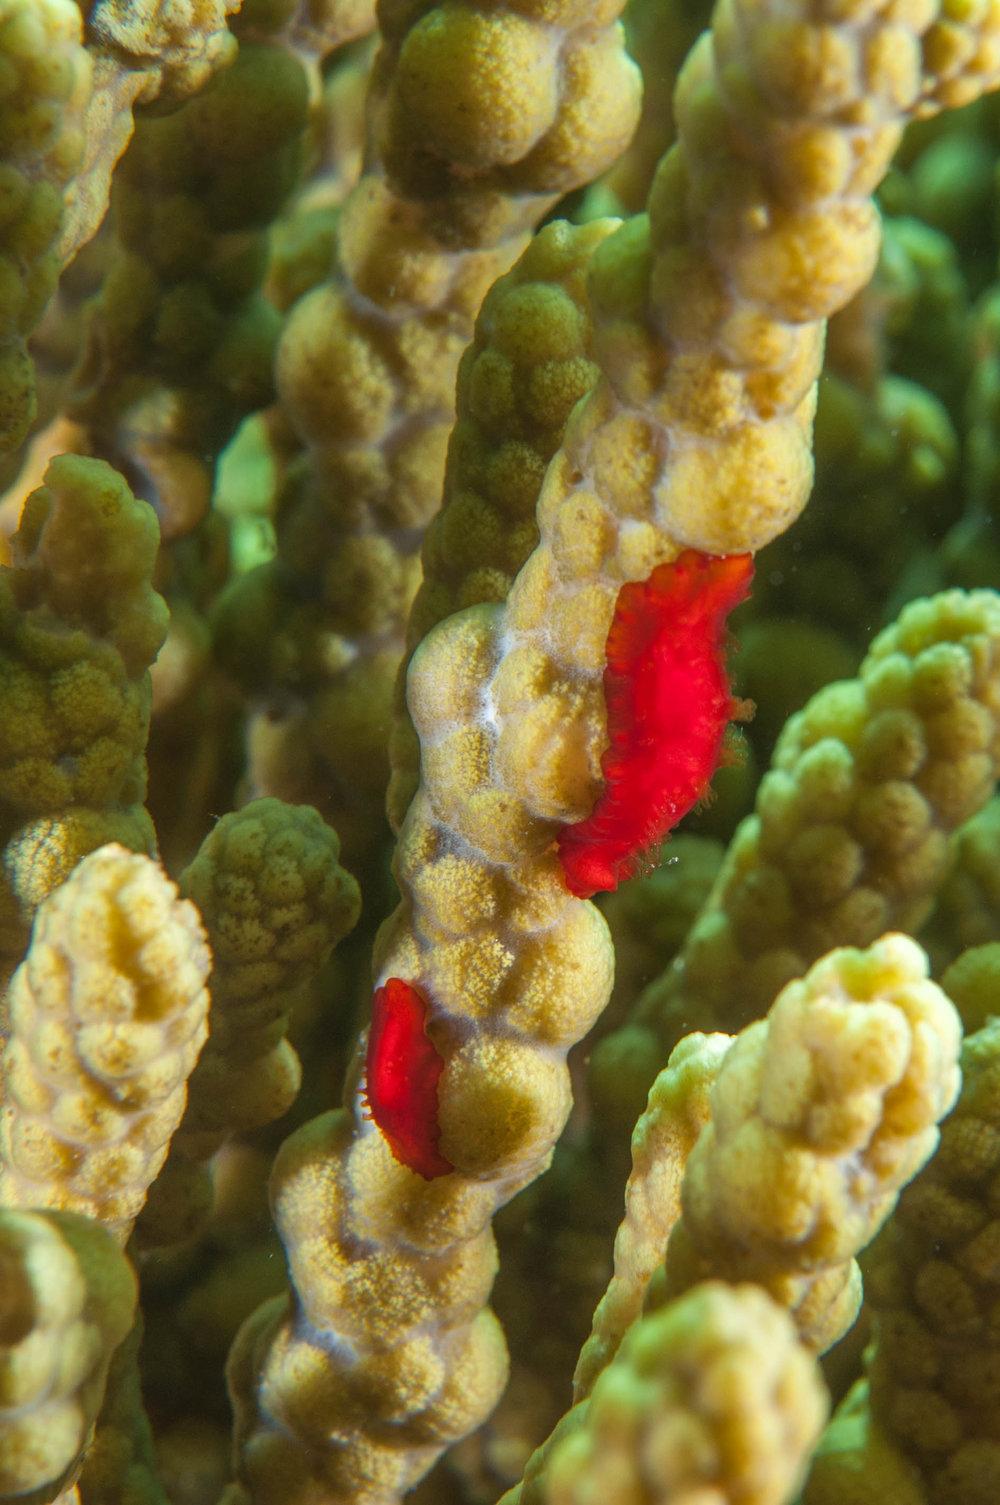 Brown algae (Coeloplana scaberiae)